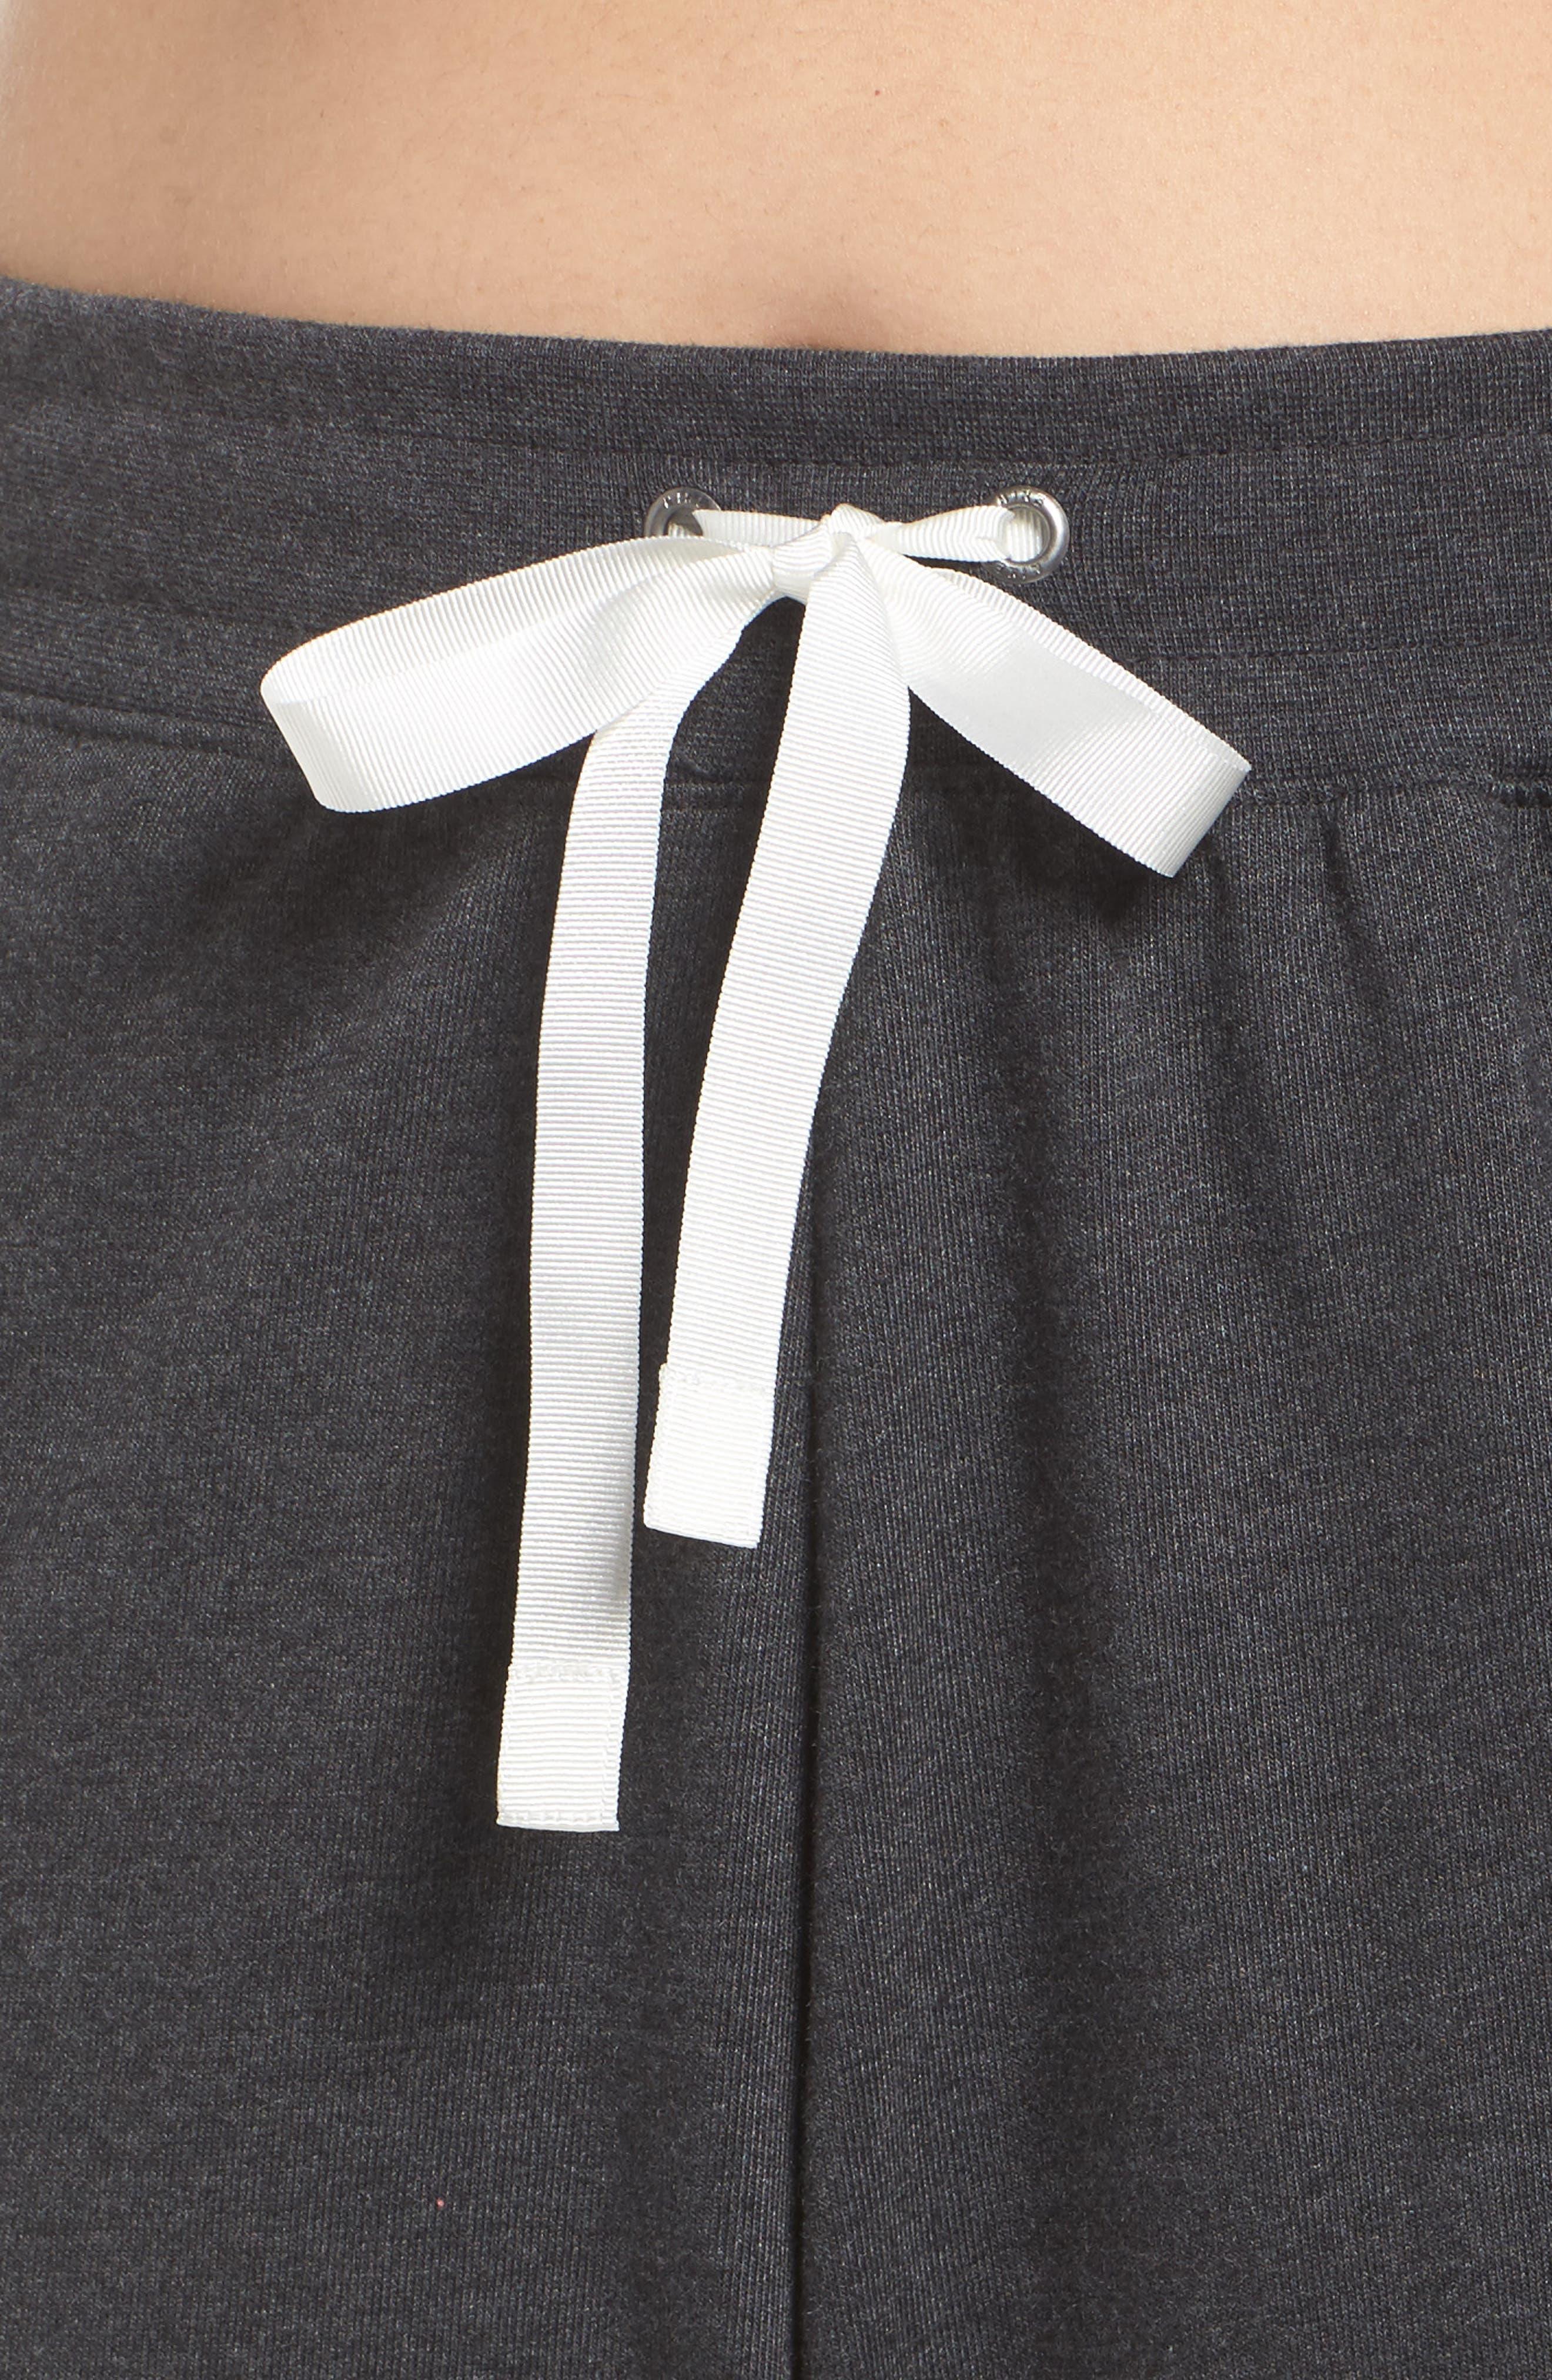 Sportswear Gym Capris,                             Alternate thumbnail 4, color,                             Black Heather/ Sail